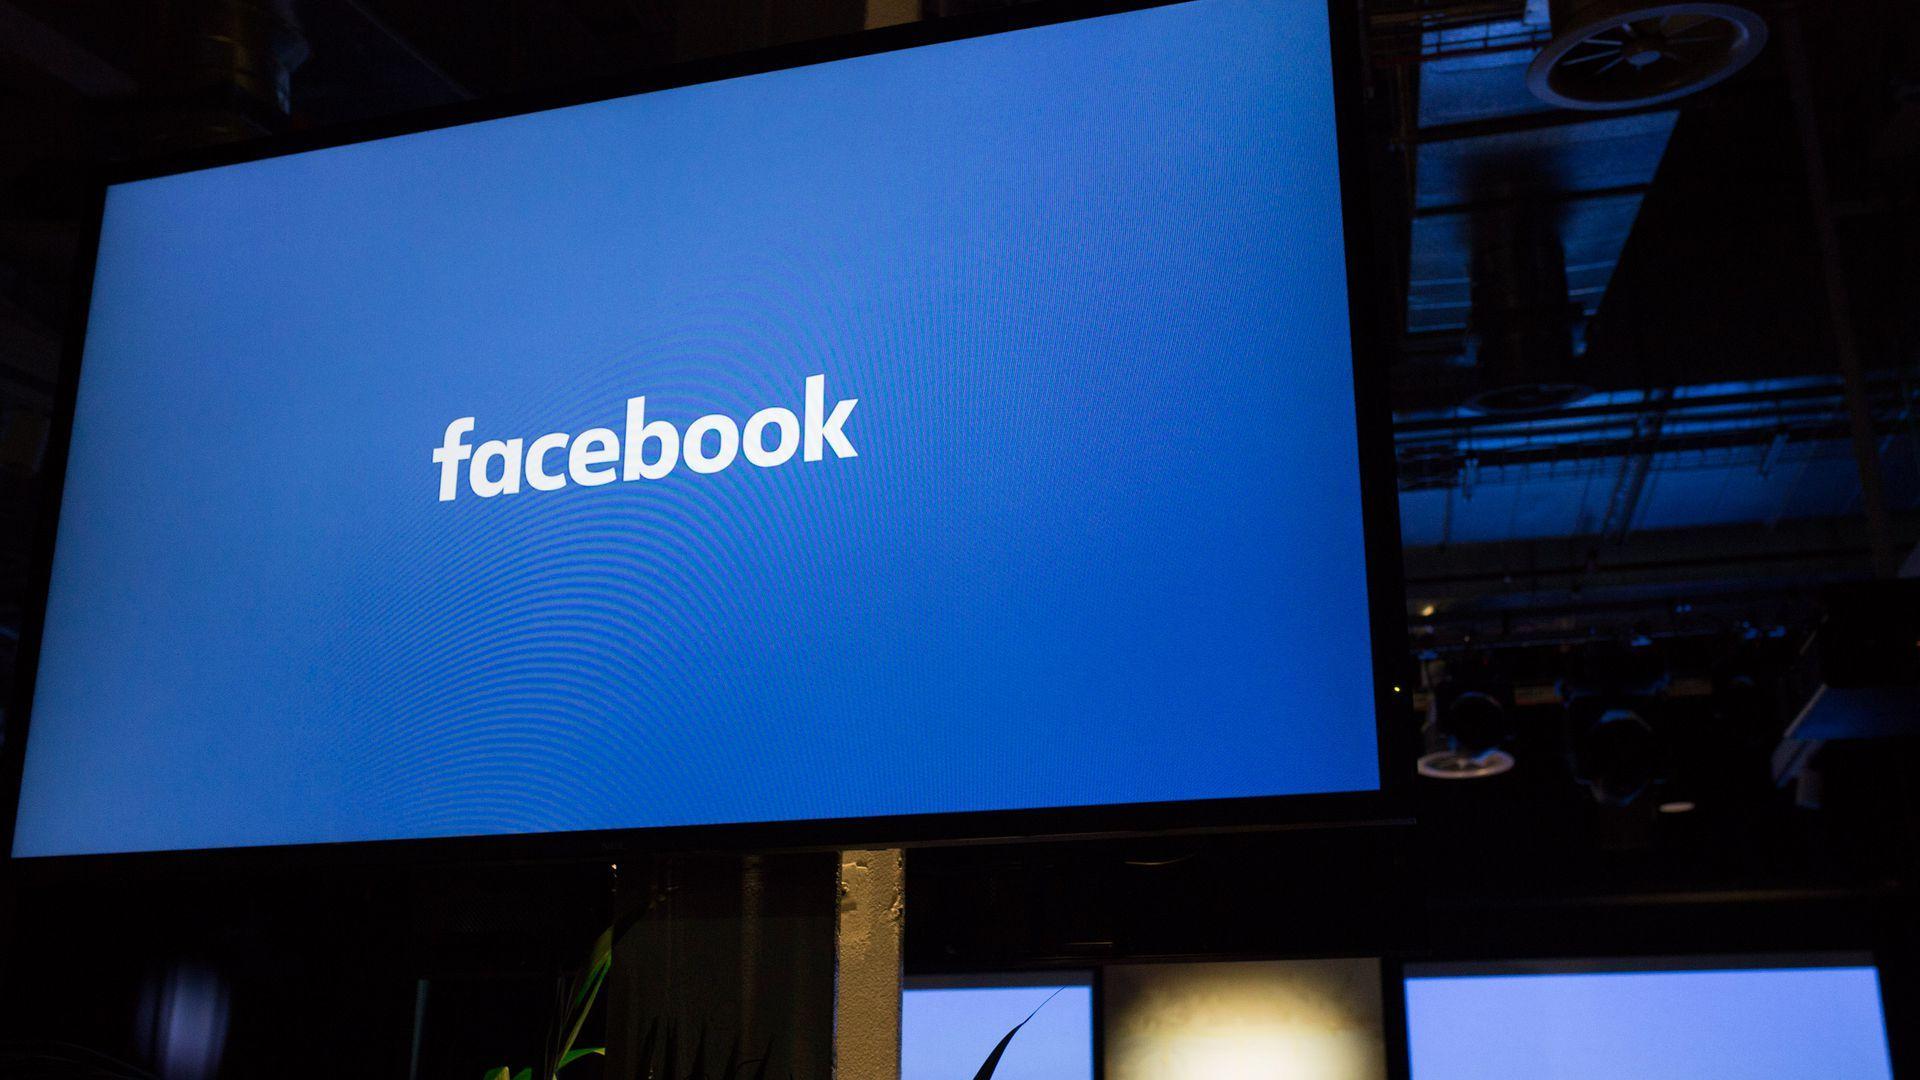 Facebook will launch news video initiative next week